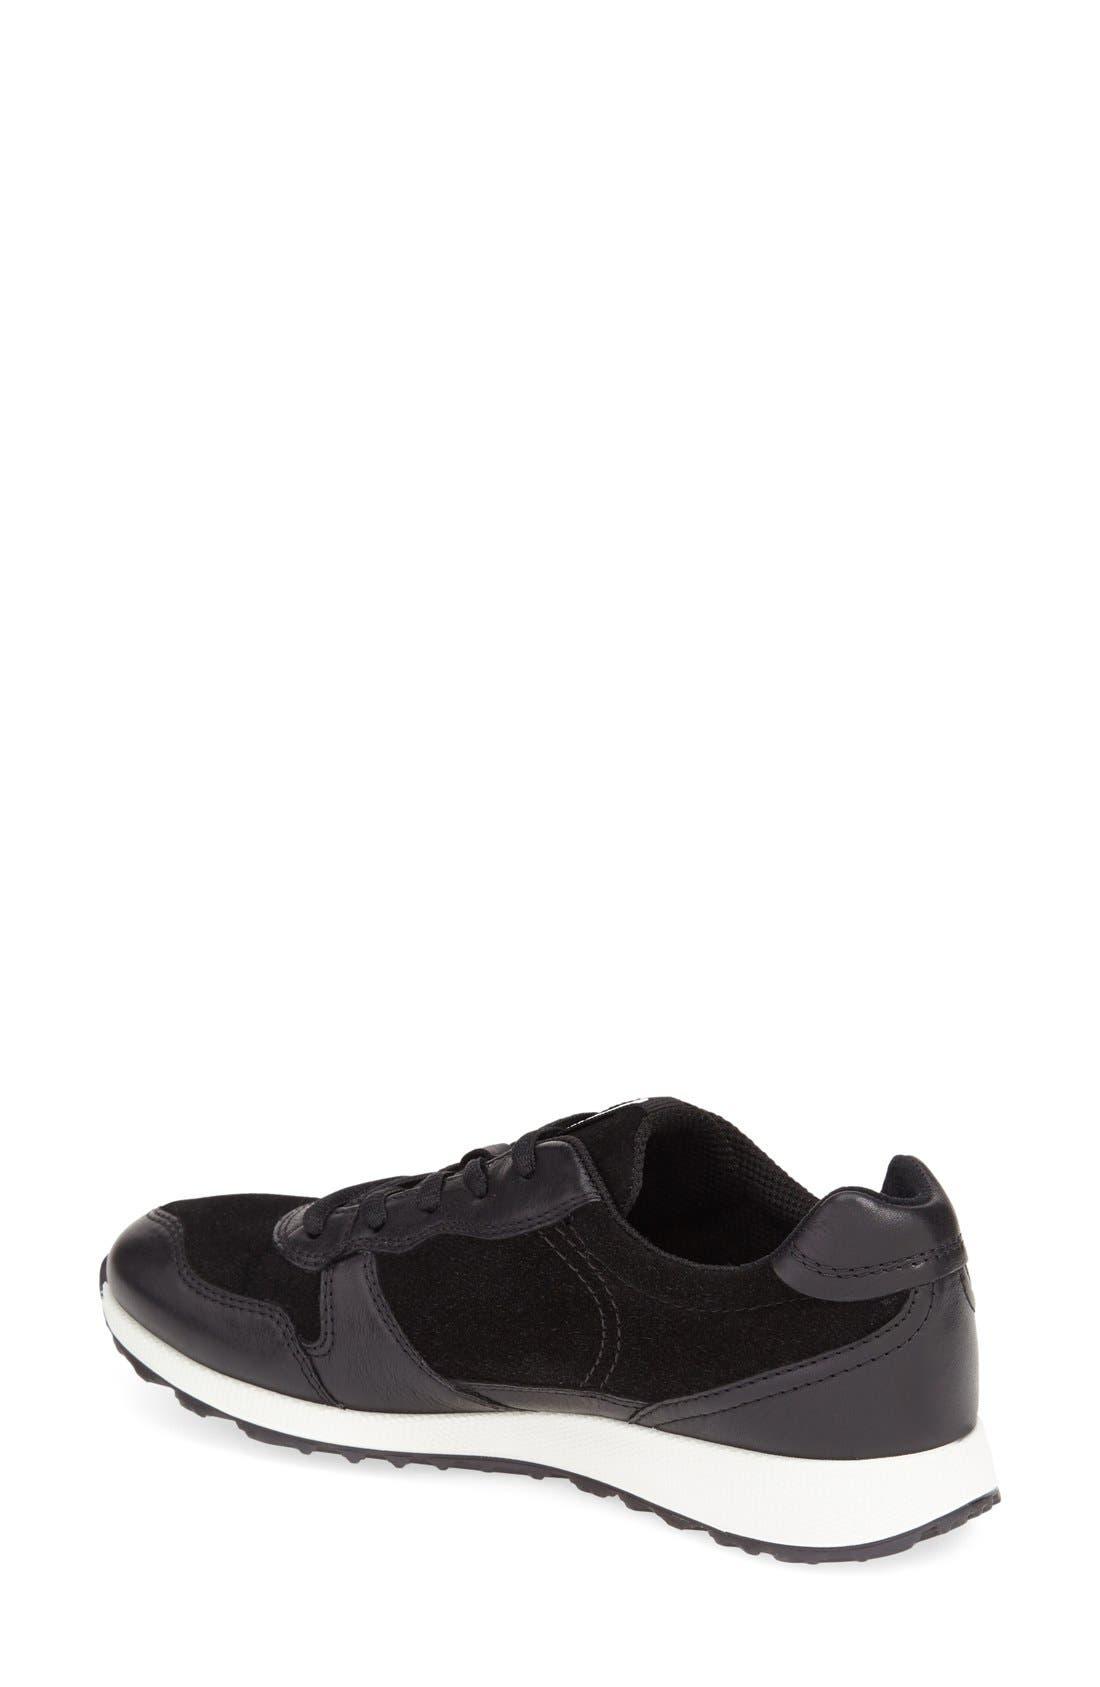 'Sneak' Sneaker,                             Alternate thumbnail 3, color,                             001